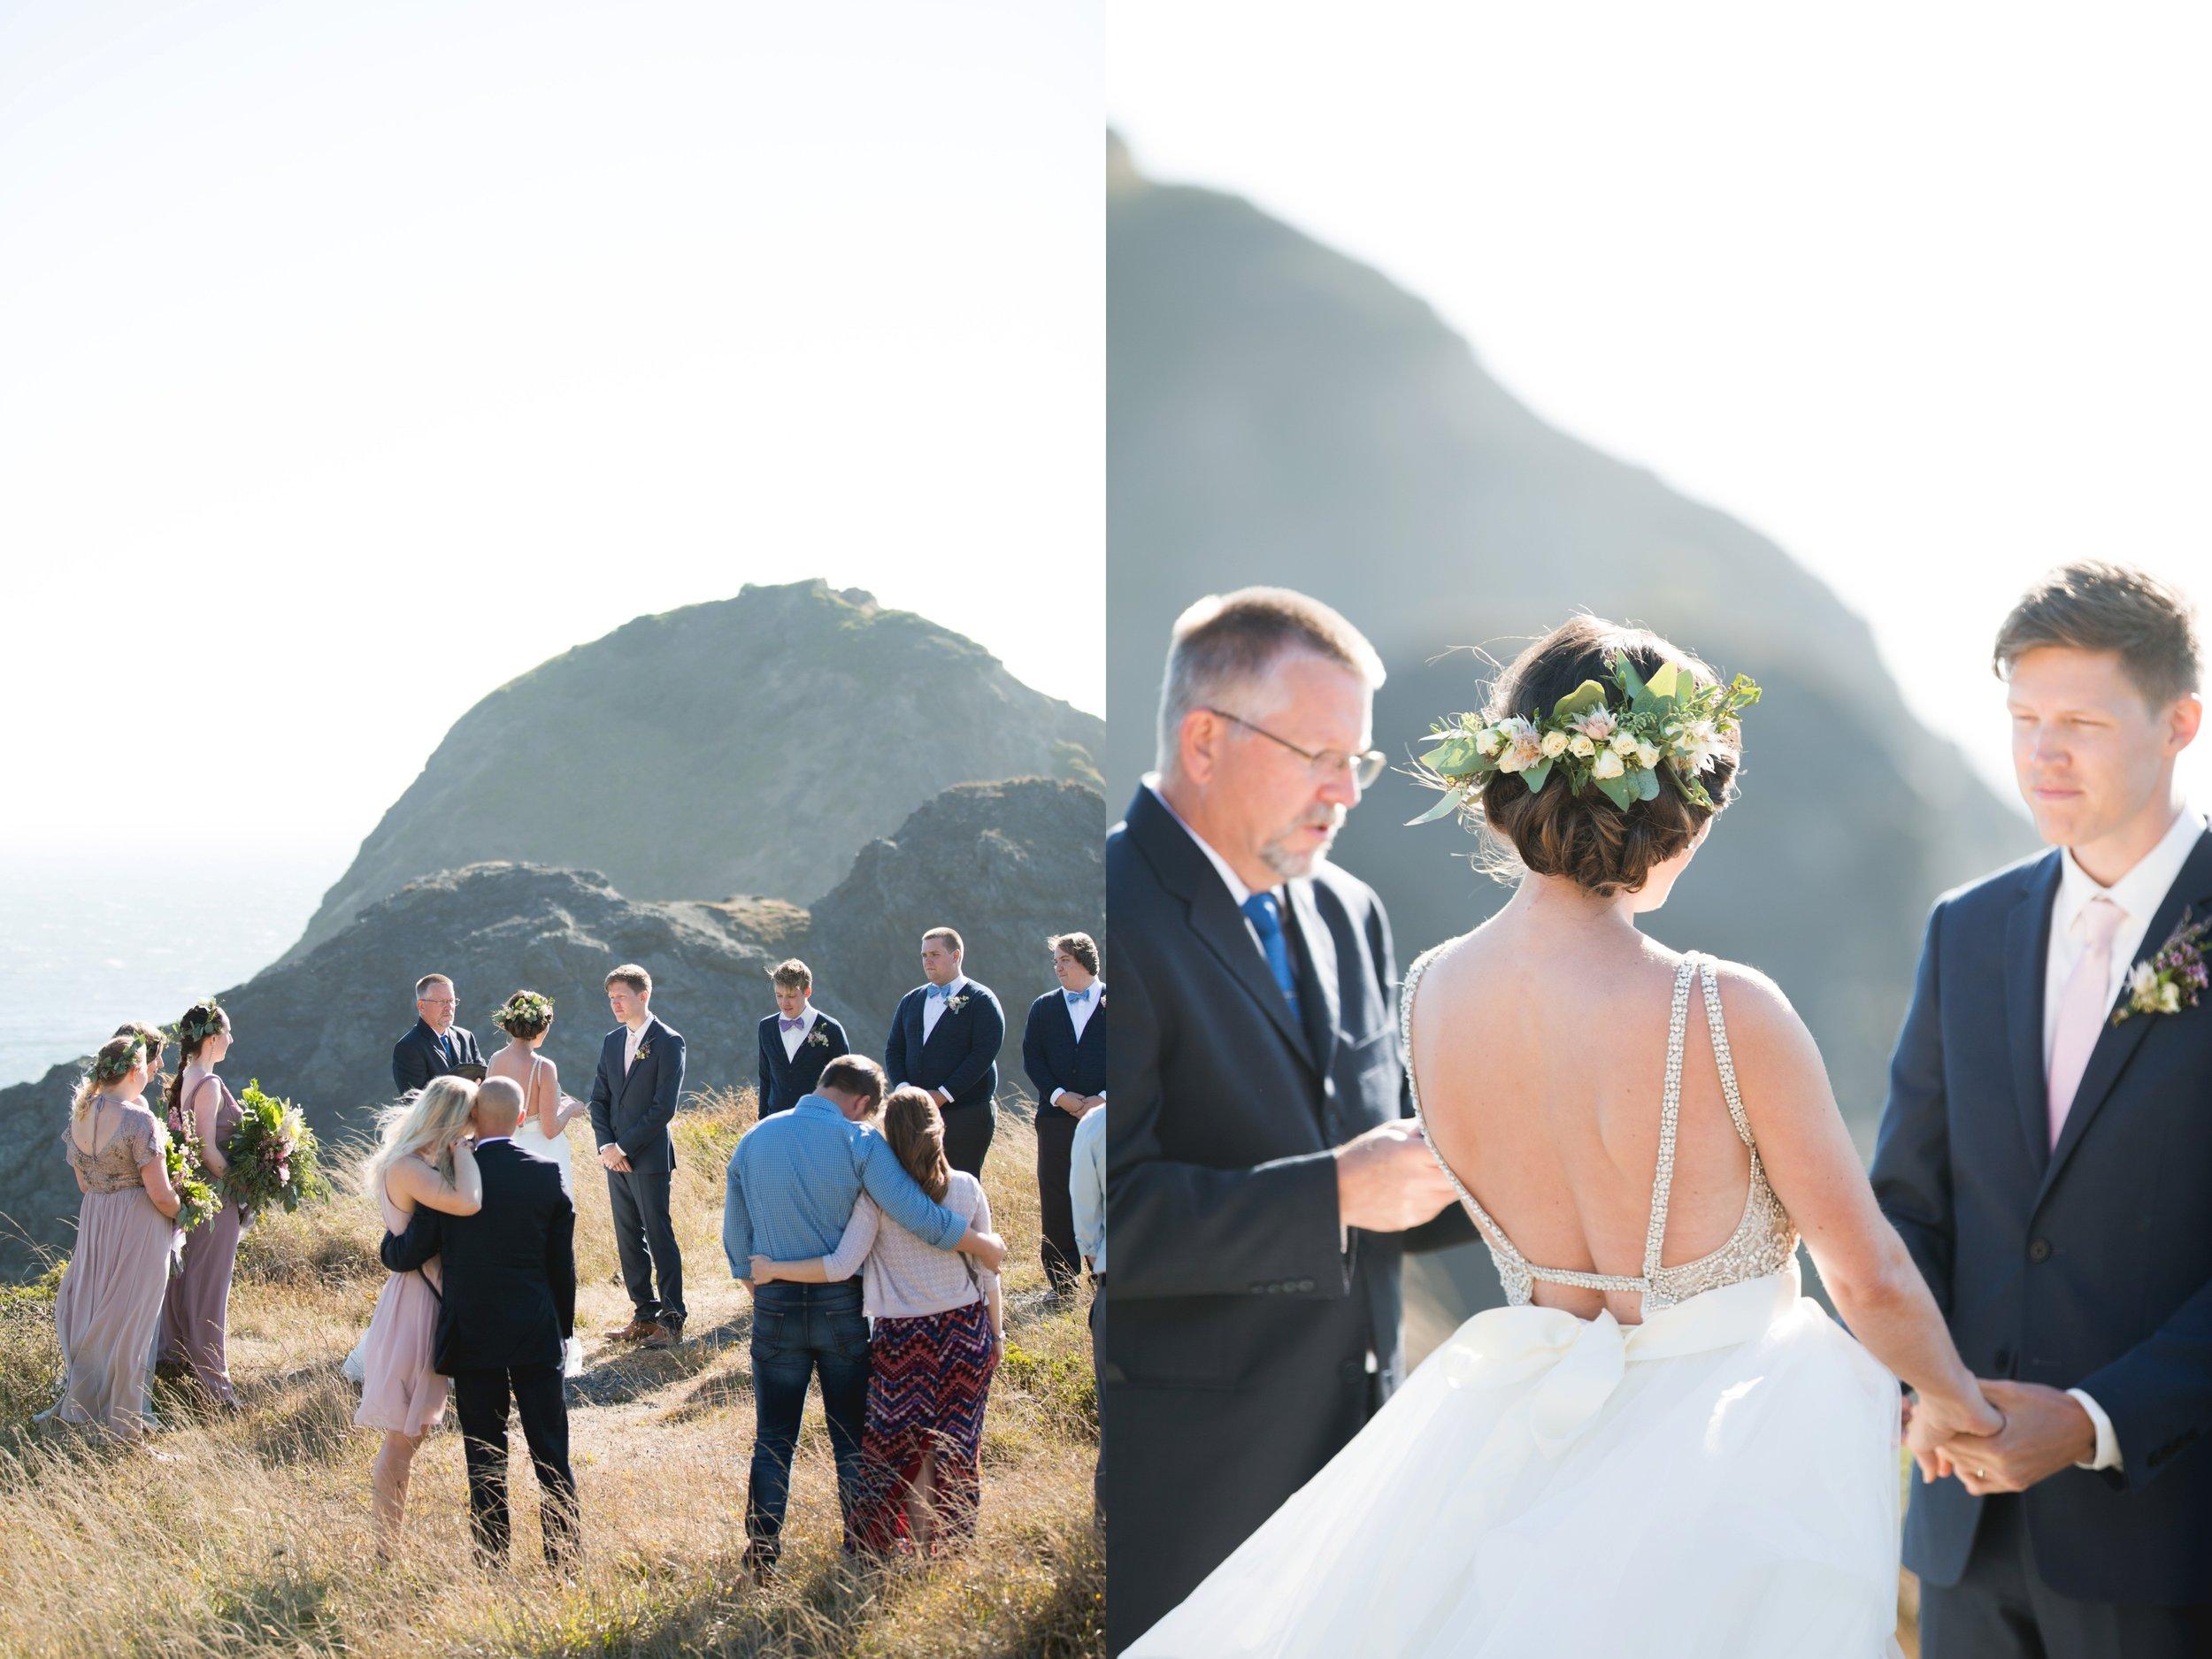 Komorebi Photography Destination Weddings